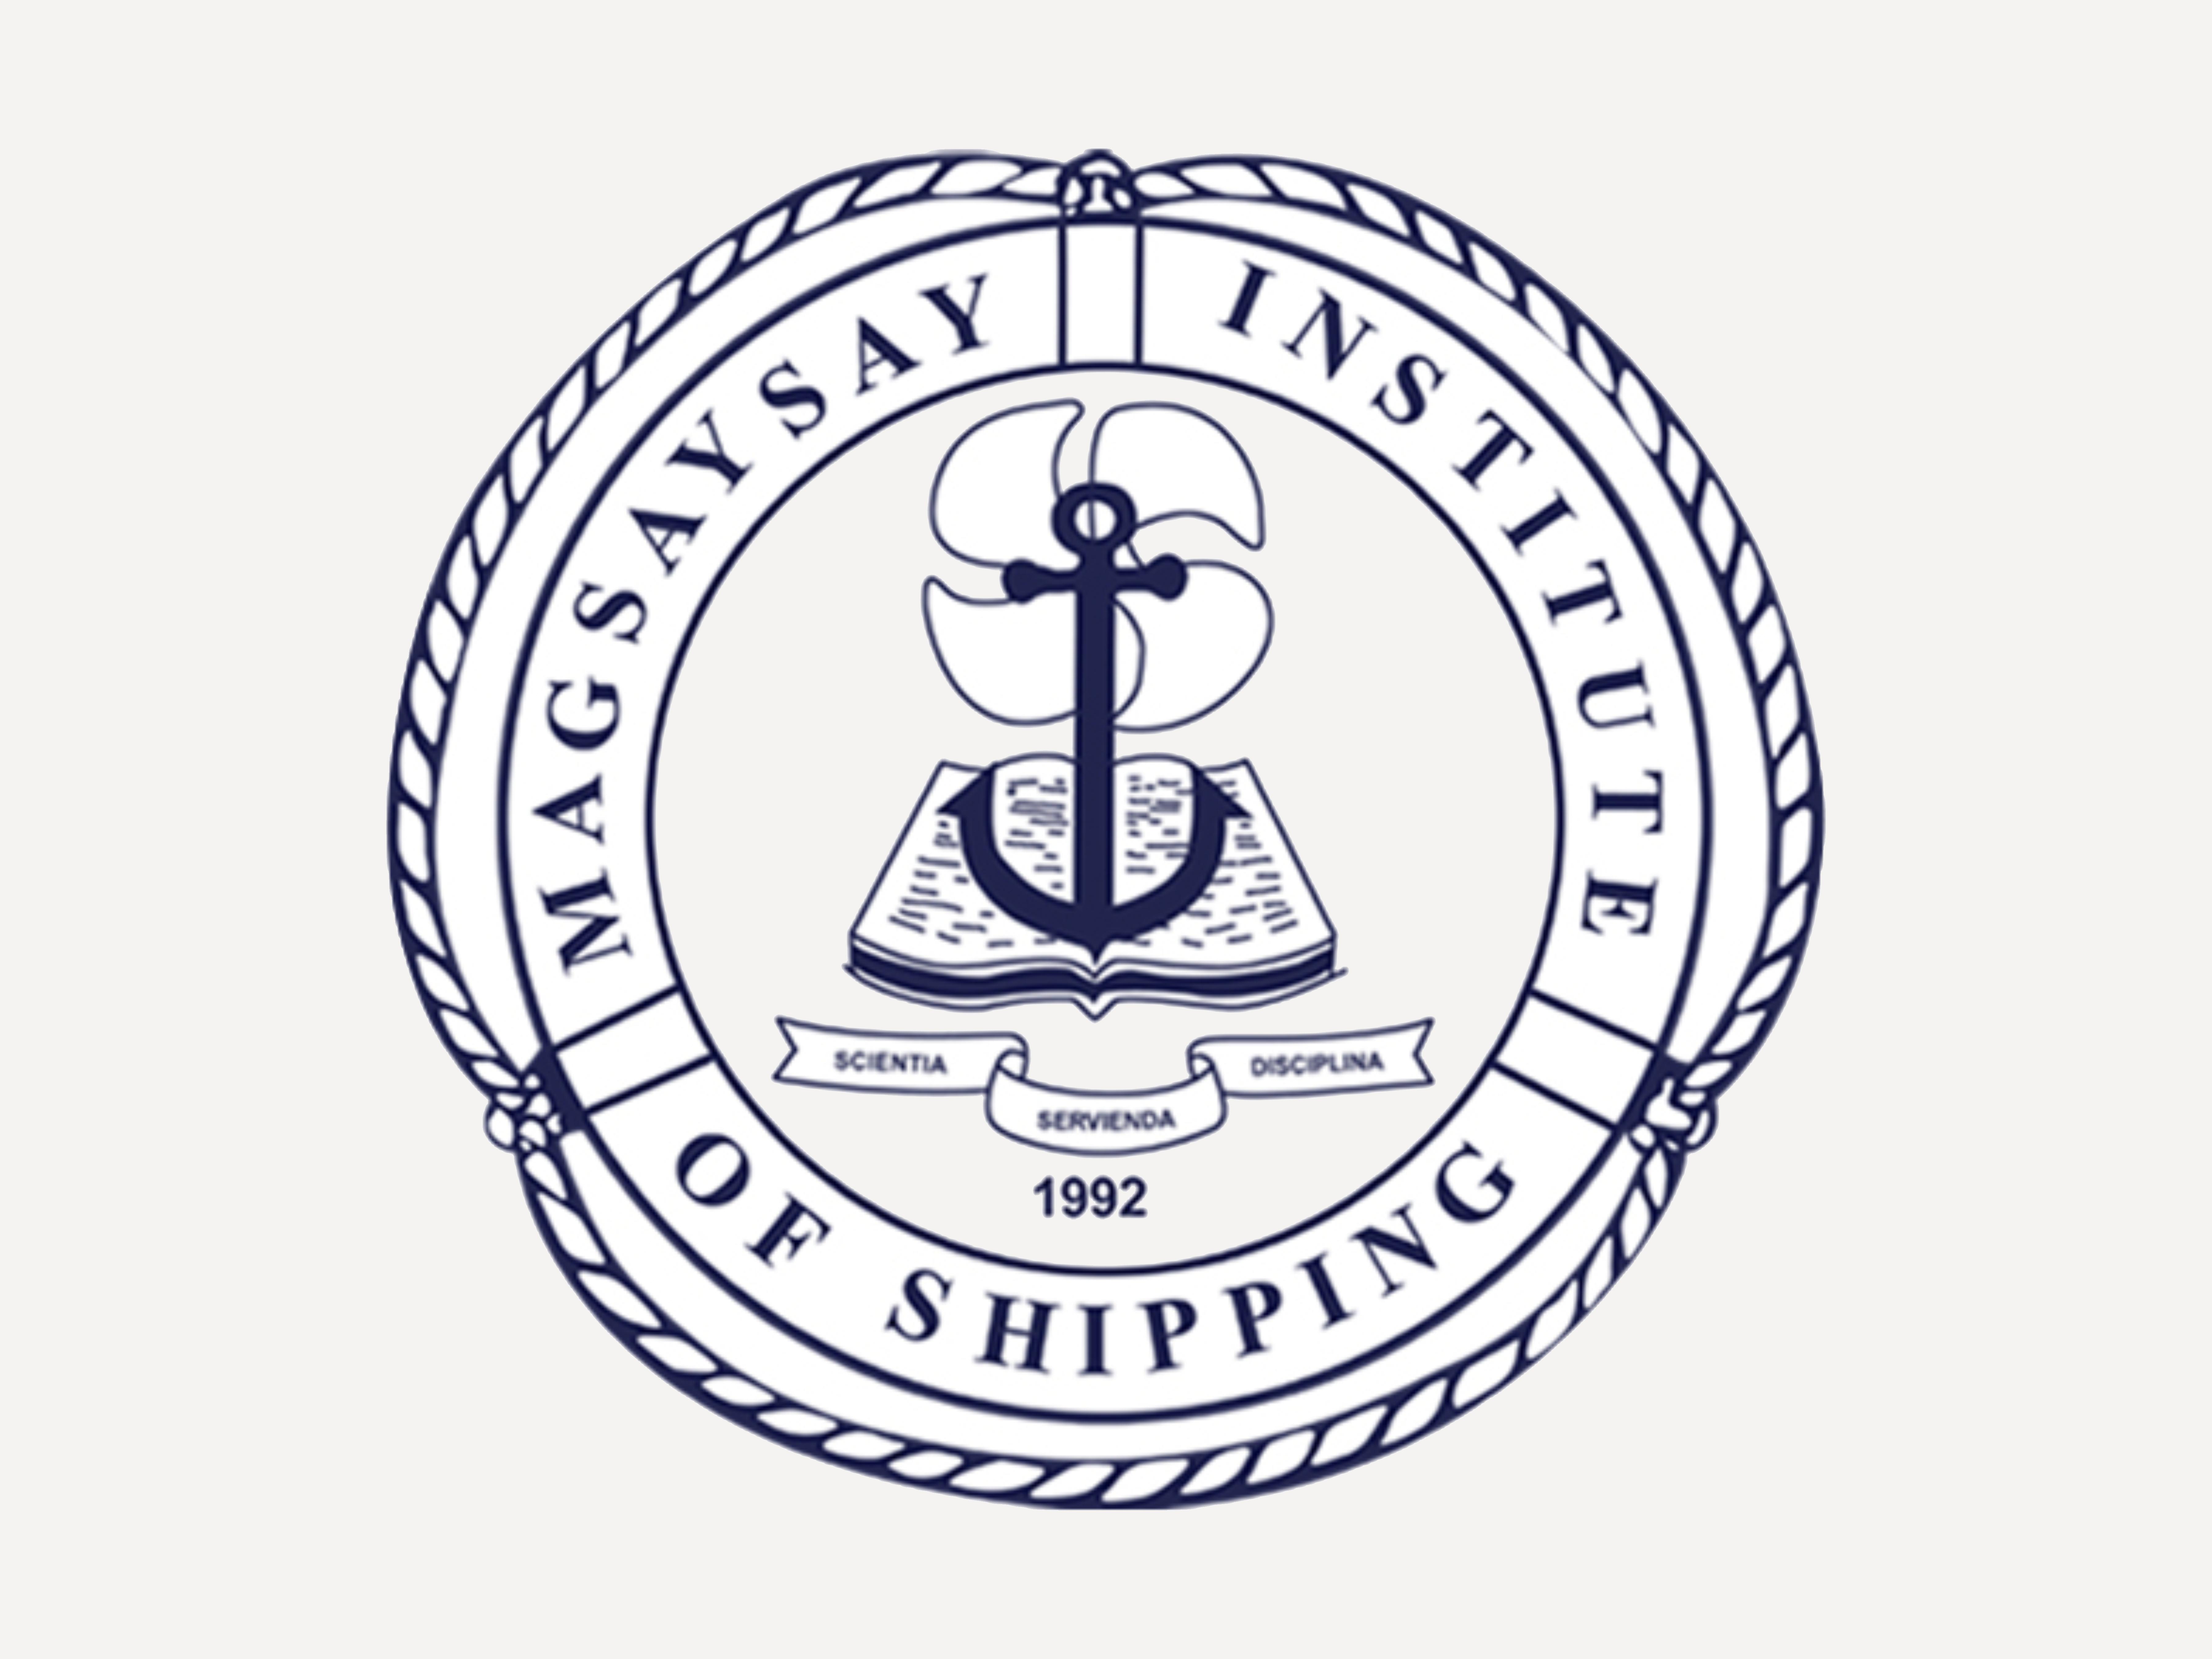 Mariners Legazpi